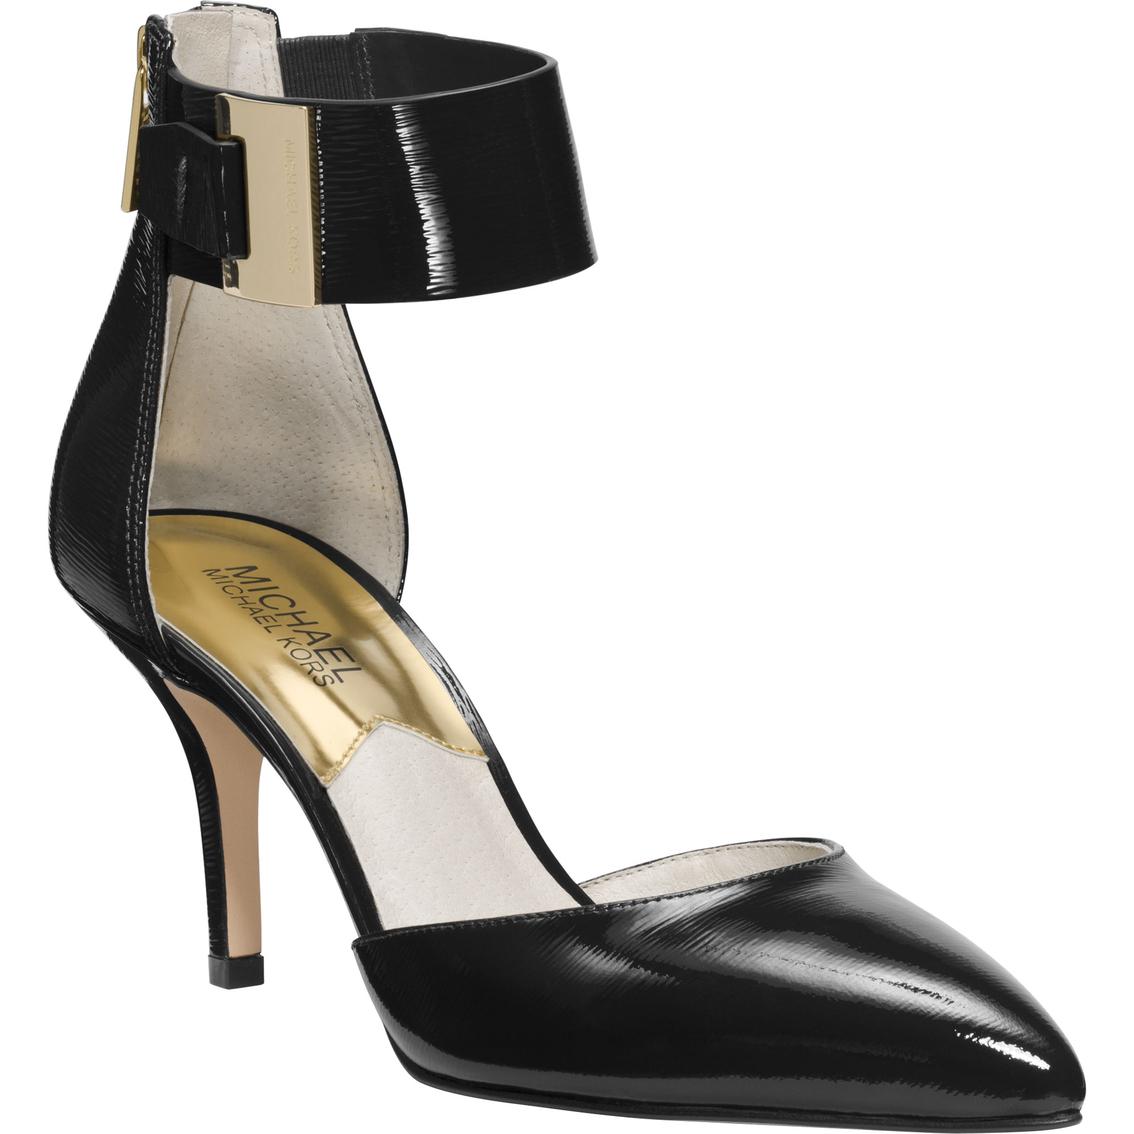 b229cb21ef35 Michael Kors Guiliana Ankle Strap Heels